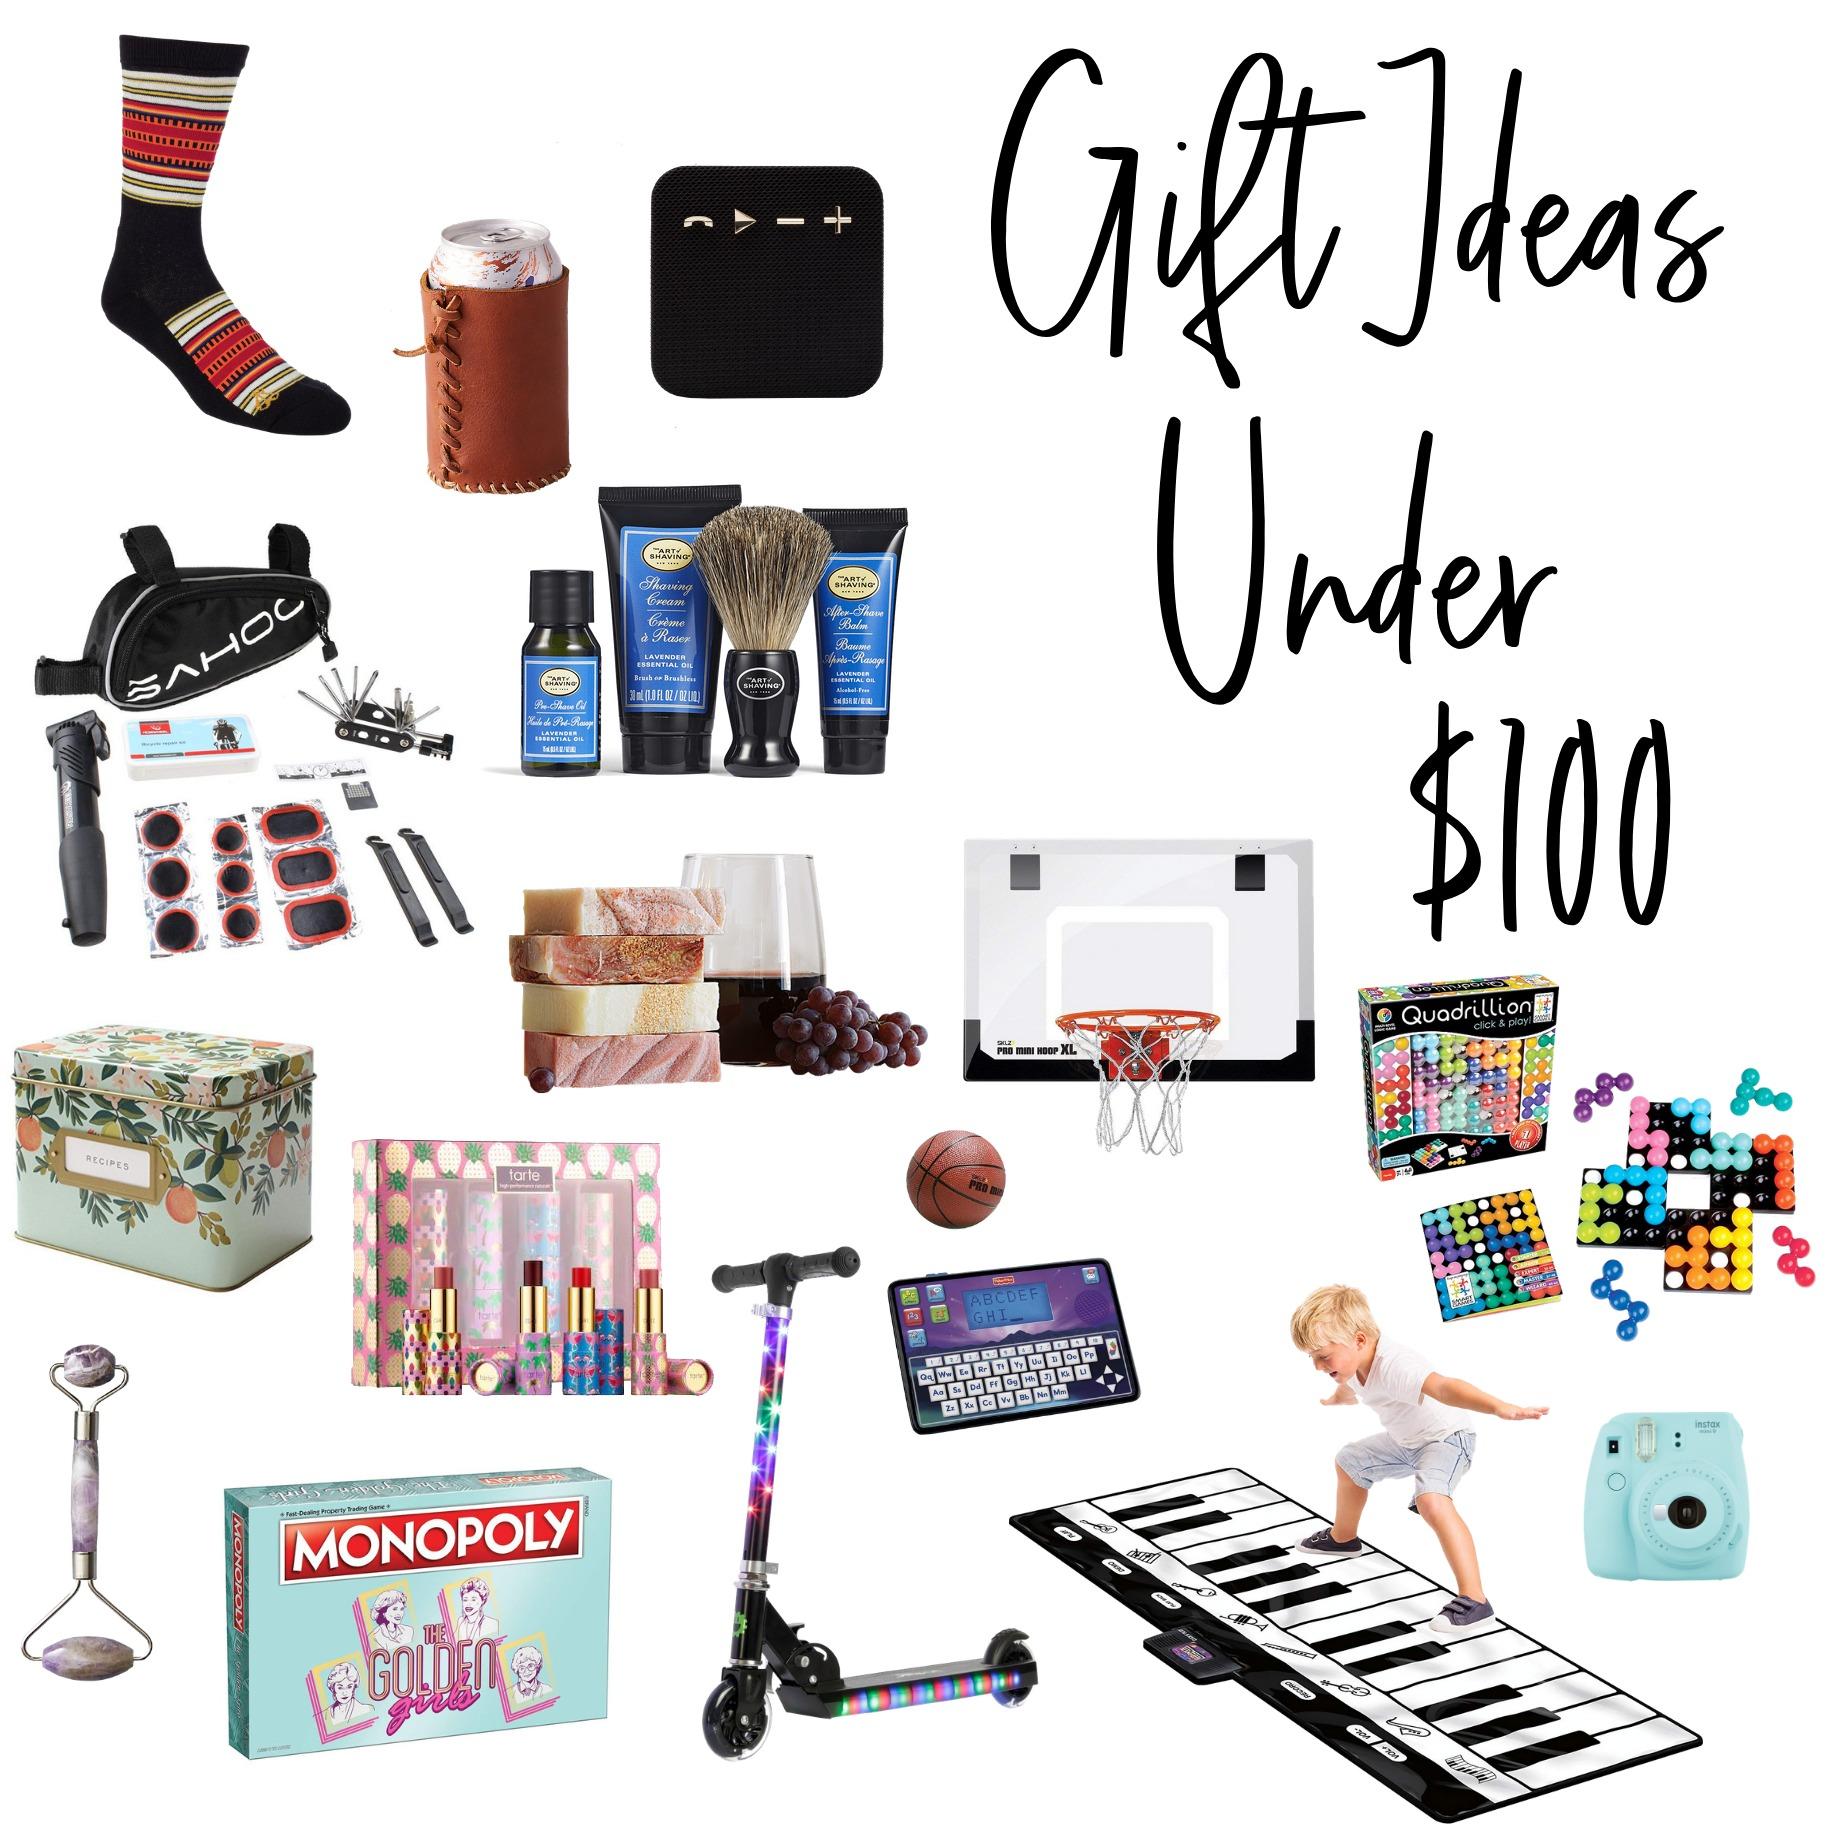 Gift Ideas under $100 | hprallandco.com